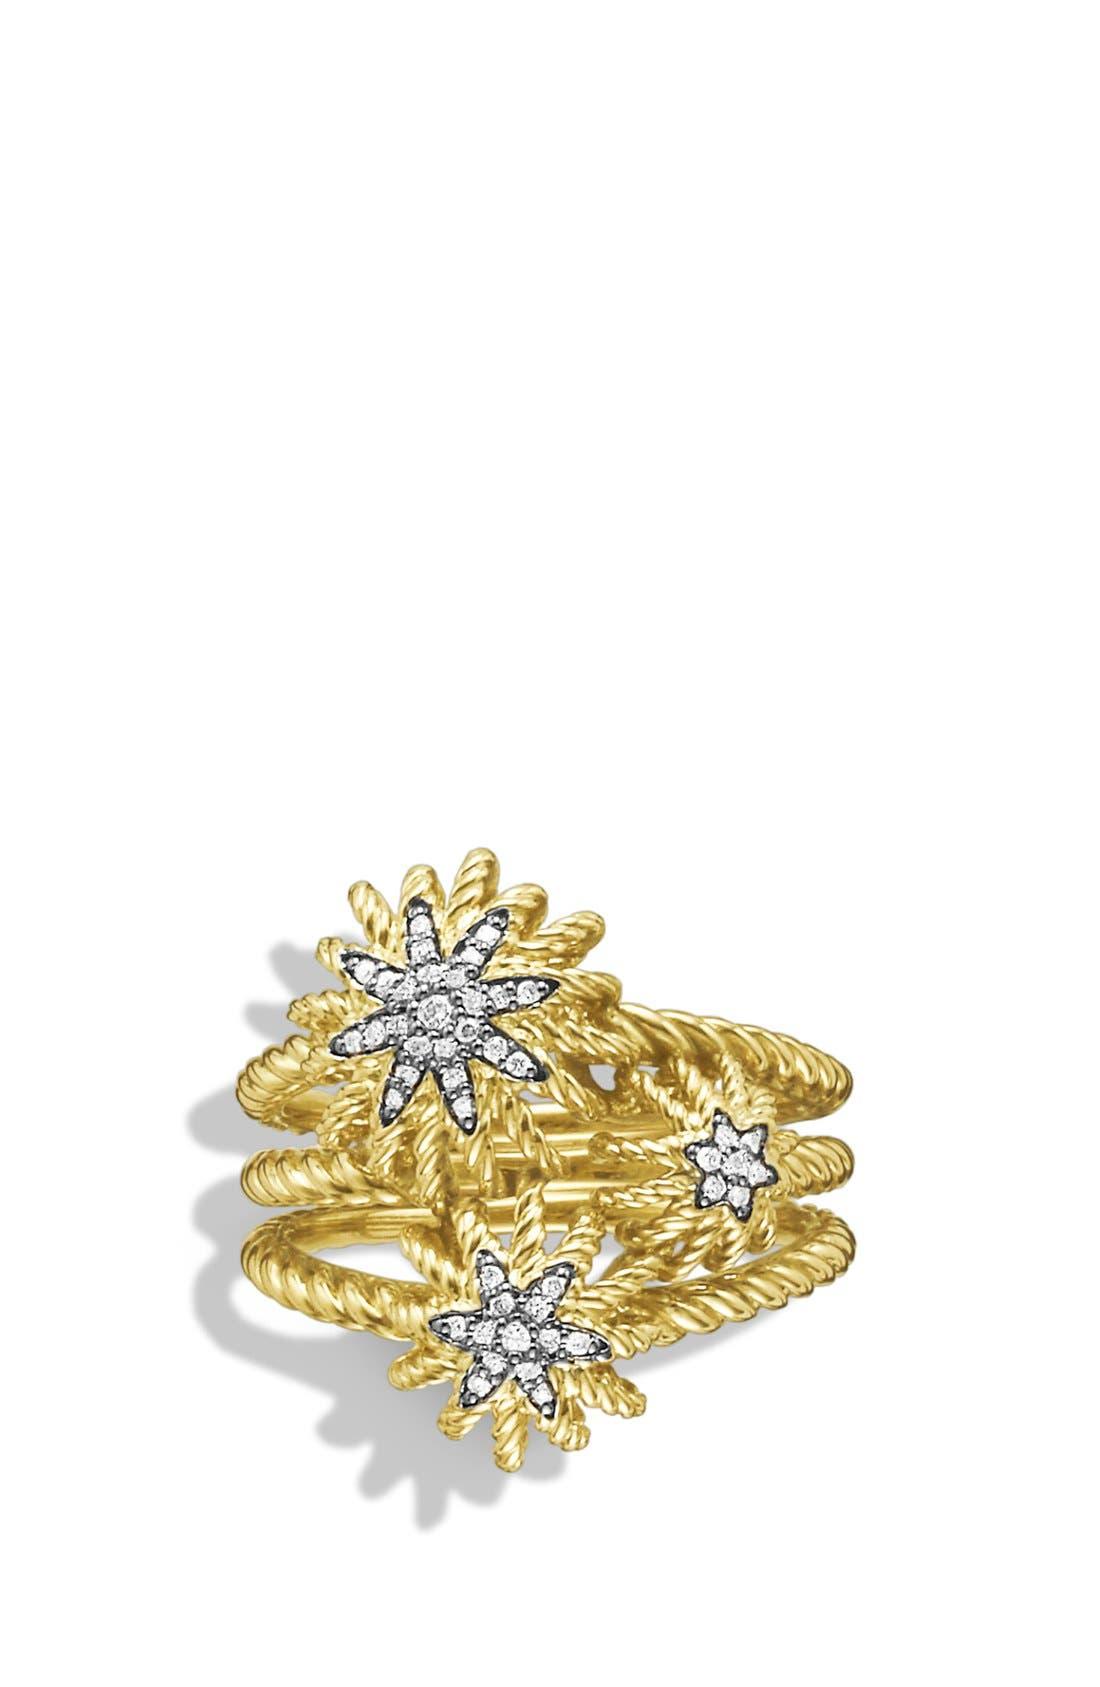 Alternate Image 3  - David Yurman 'Starburst' Cluster Ring with Diamonds in Gold